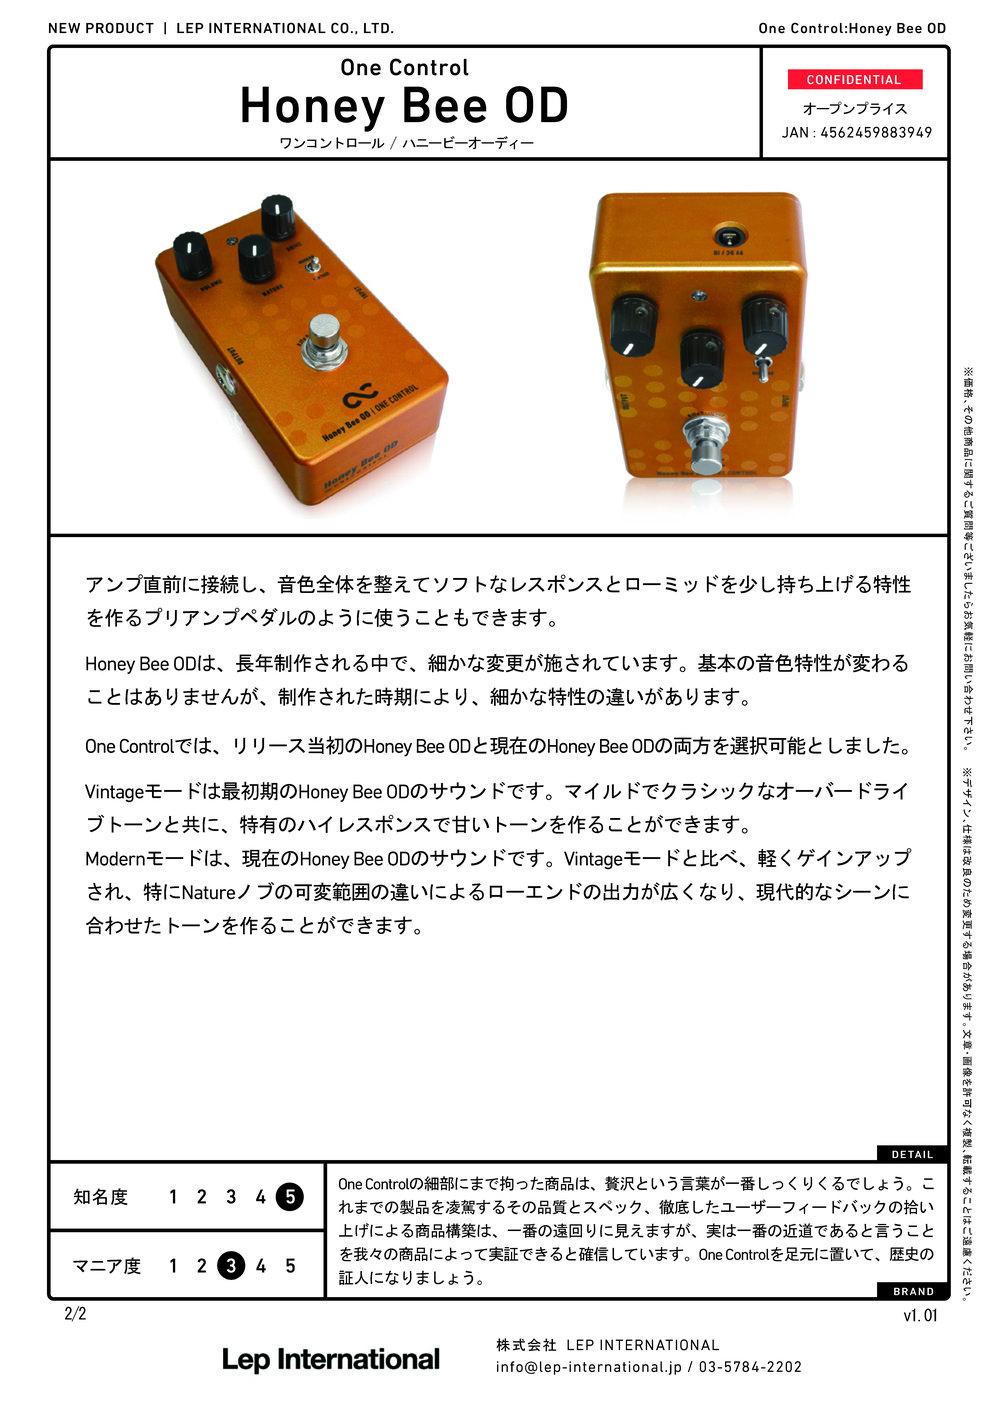 onecontrol honeybeeod v1.01_ページ_2.jpg